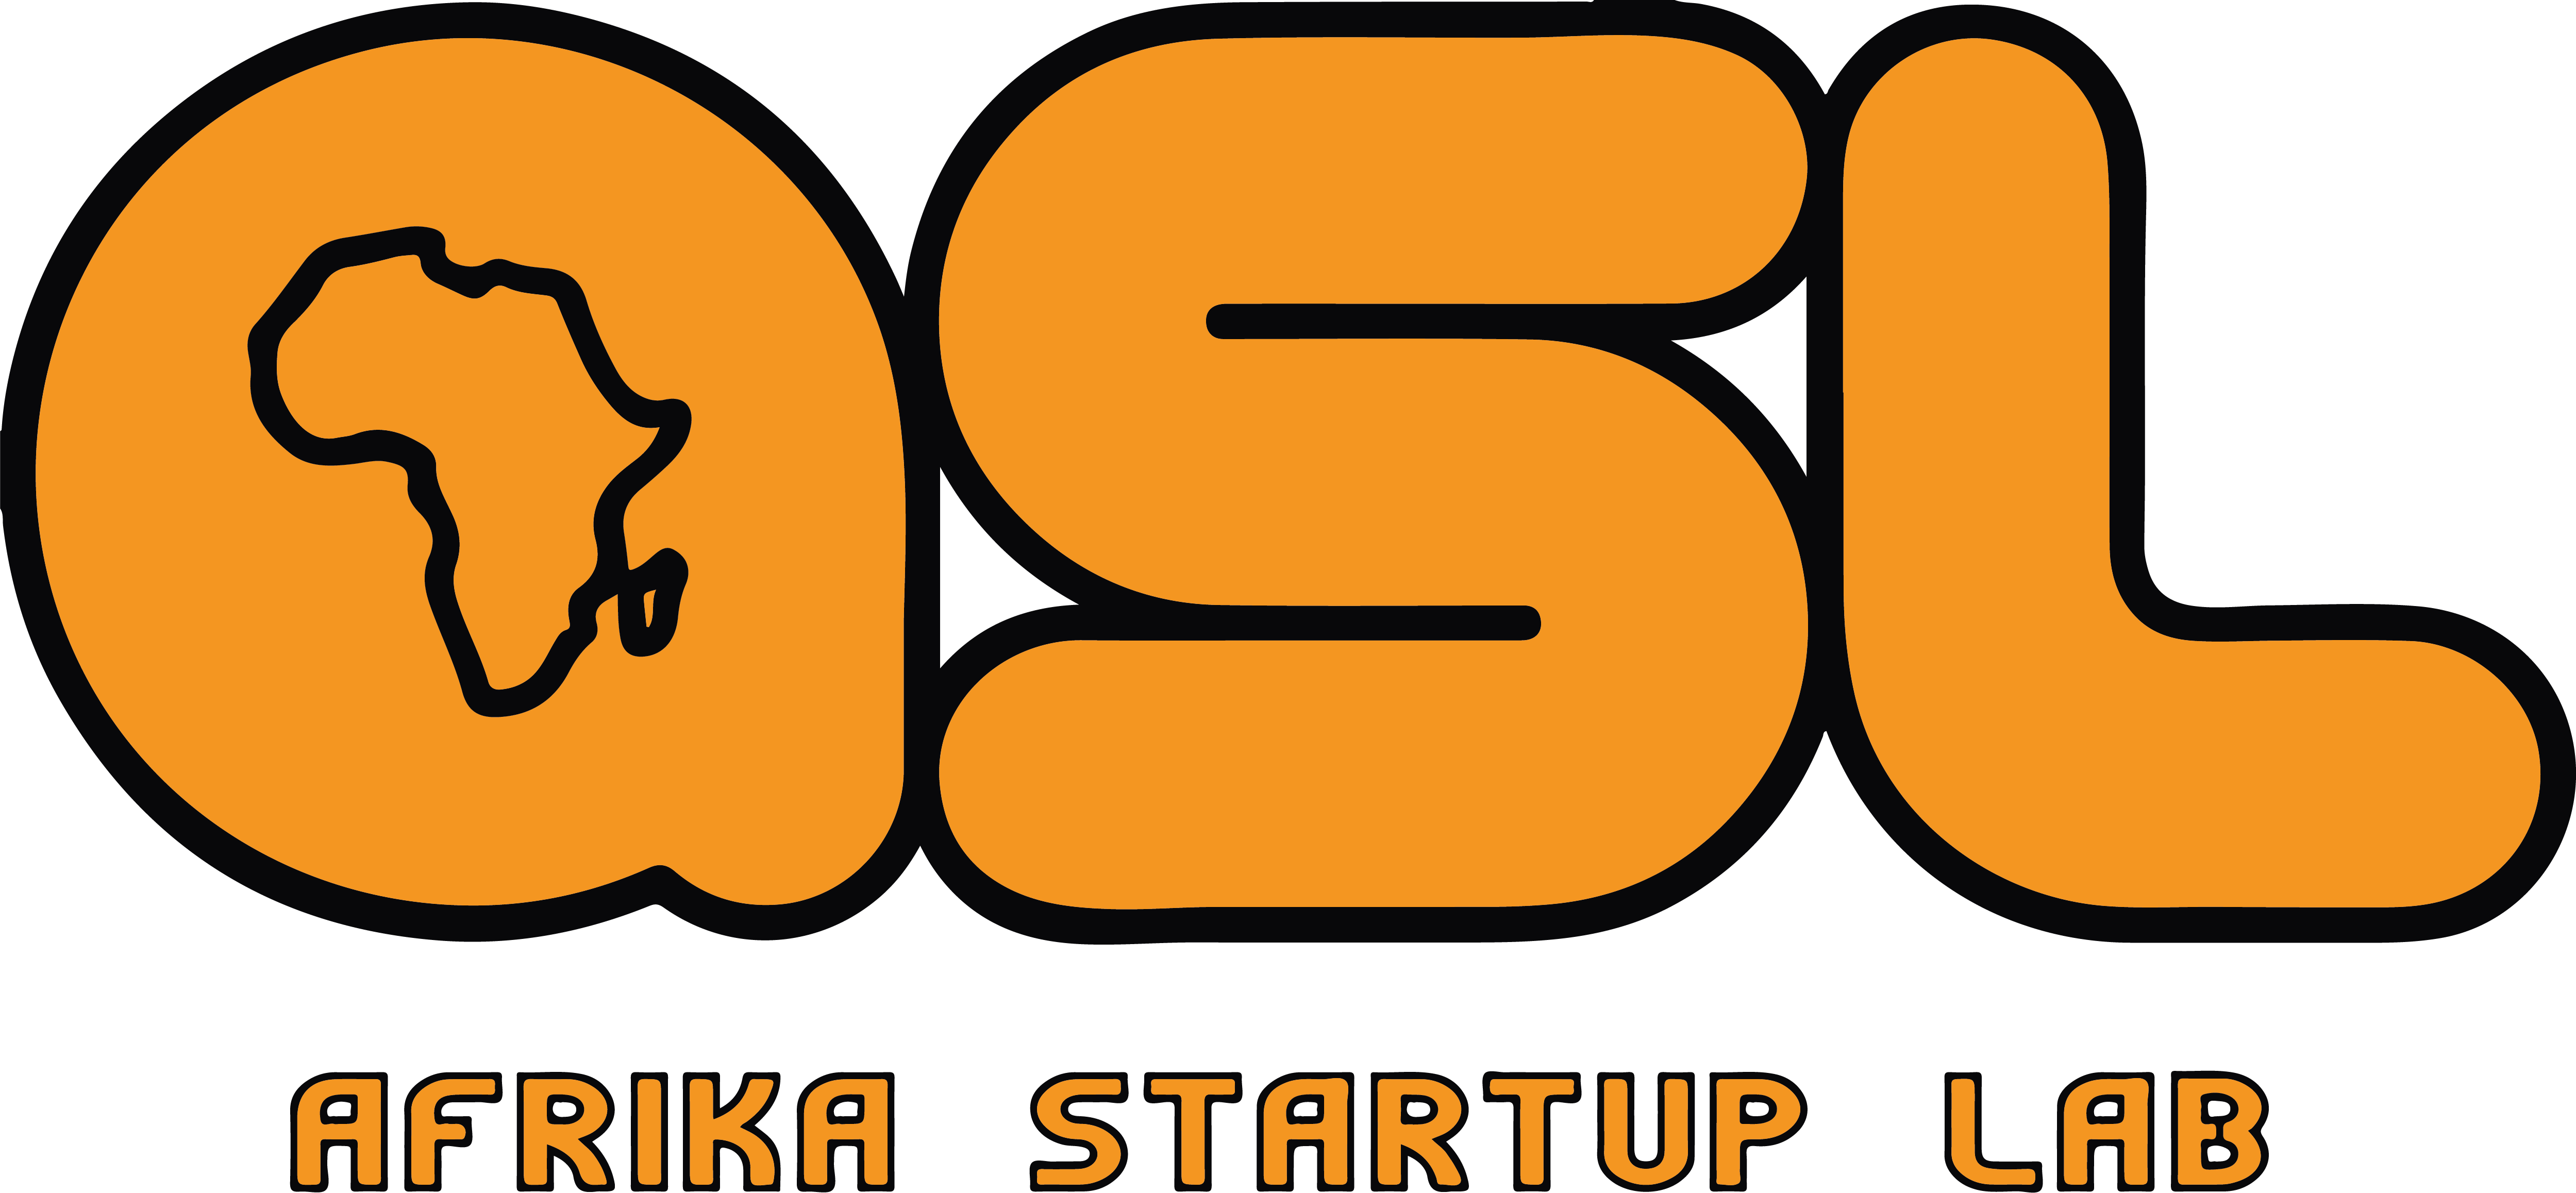 Boum III Jr, Co-Founder of Afrika Startup Lab